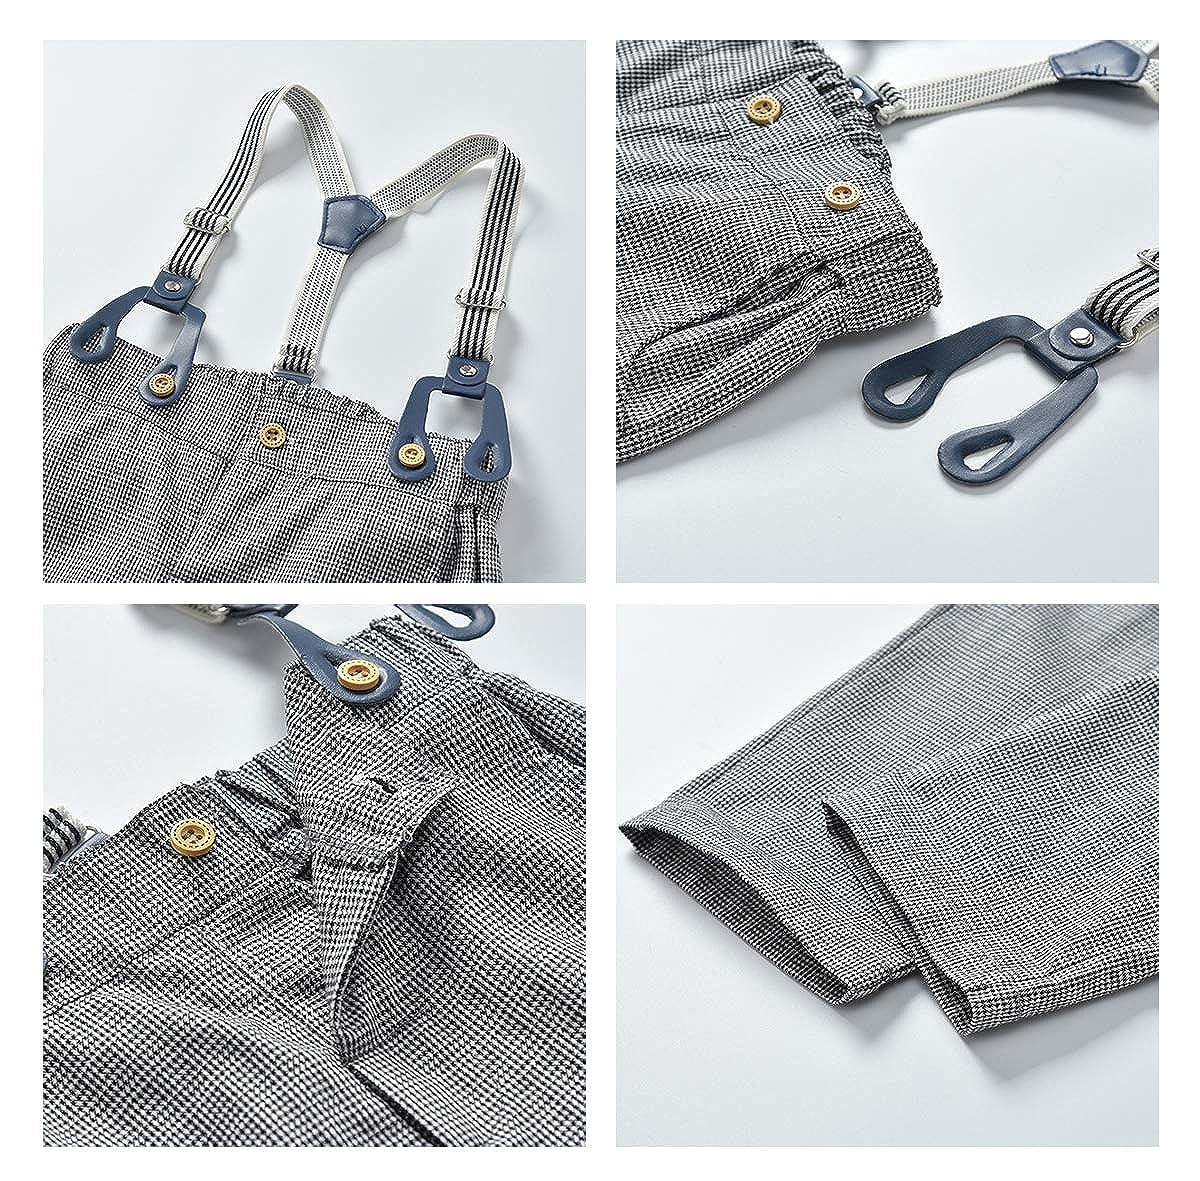 ALLAIBB Baby Toddler Boy Gentleman Outfit Dress Shirt+Suspender Plaid Pants 2Pcs Set